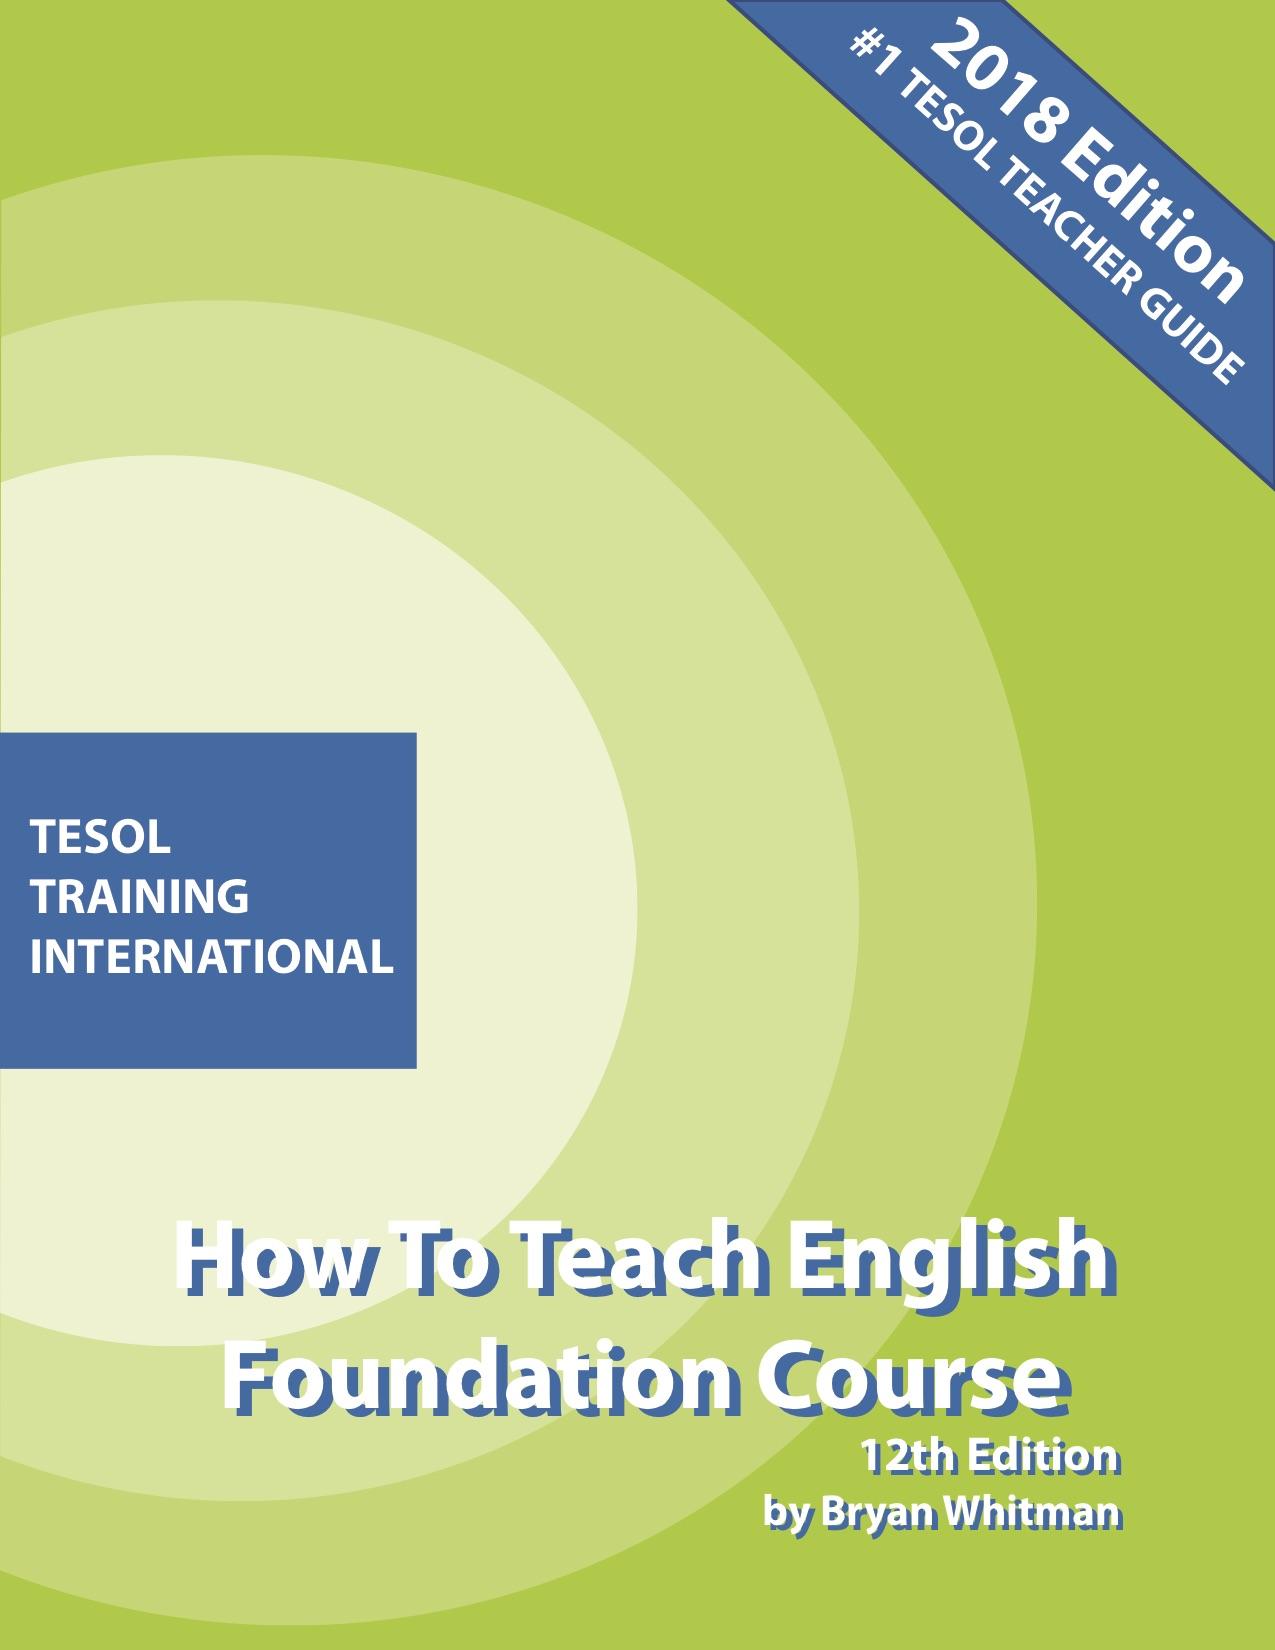 TESOL  Foundation Course